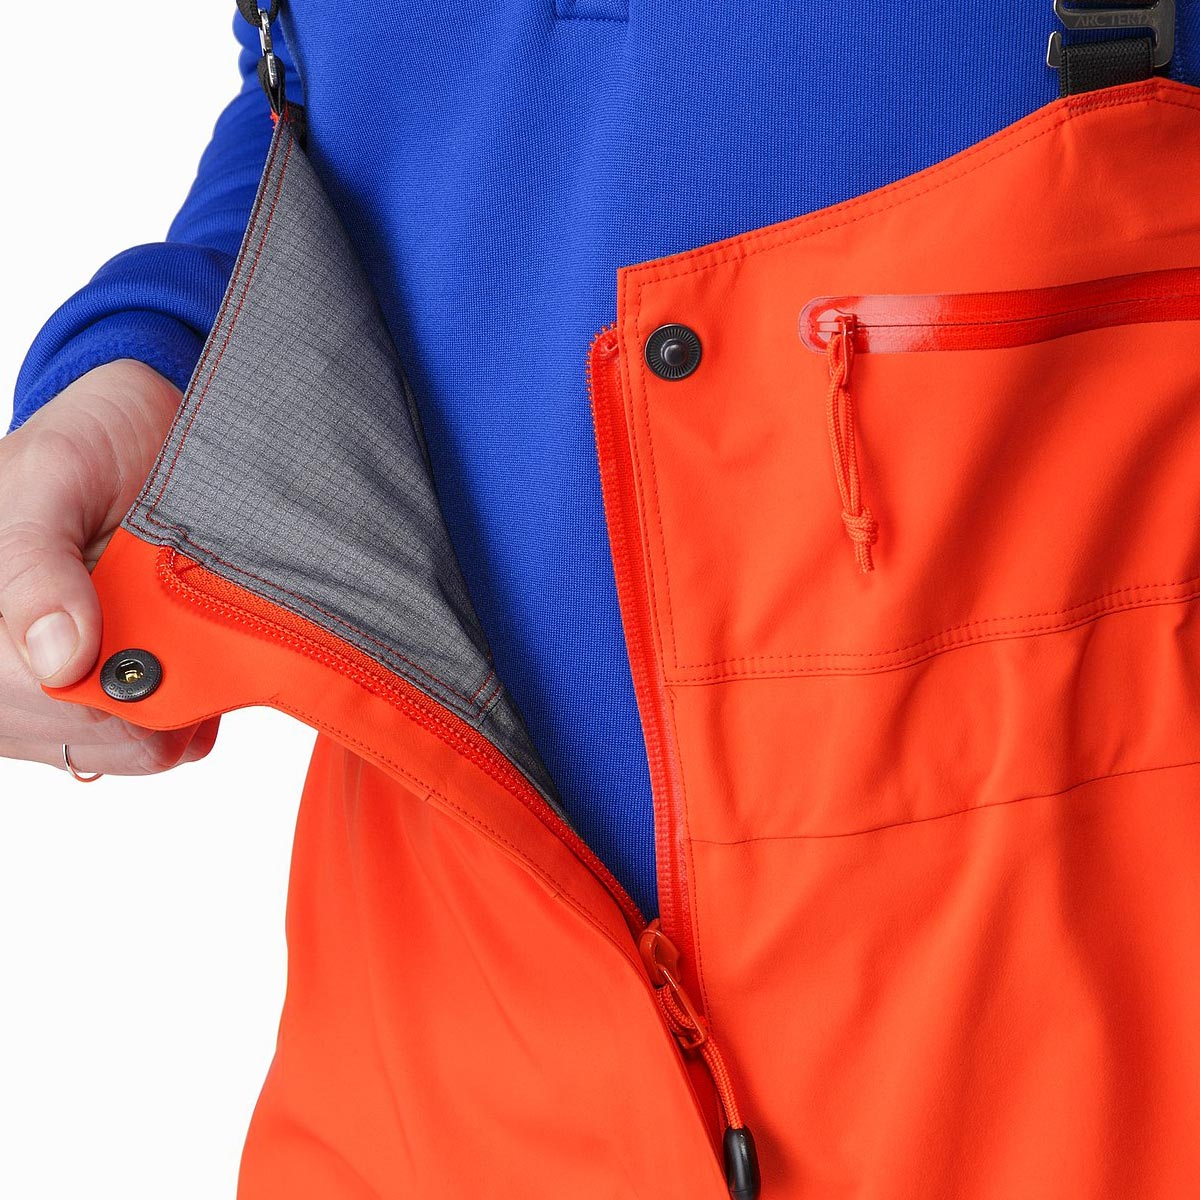 478b4203a4 Arc'teryx Theta SV Bib, women's (free ground shipping) :: Waterproof Shell  Pants :: Pants and shorts :: Clothing and Footwear :: Moontrail